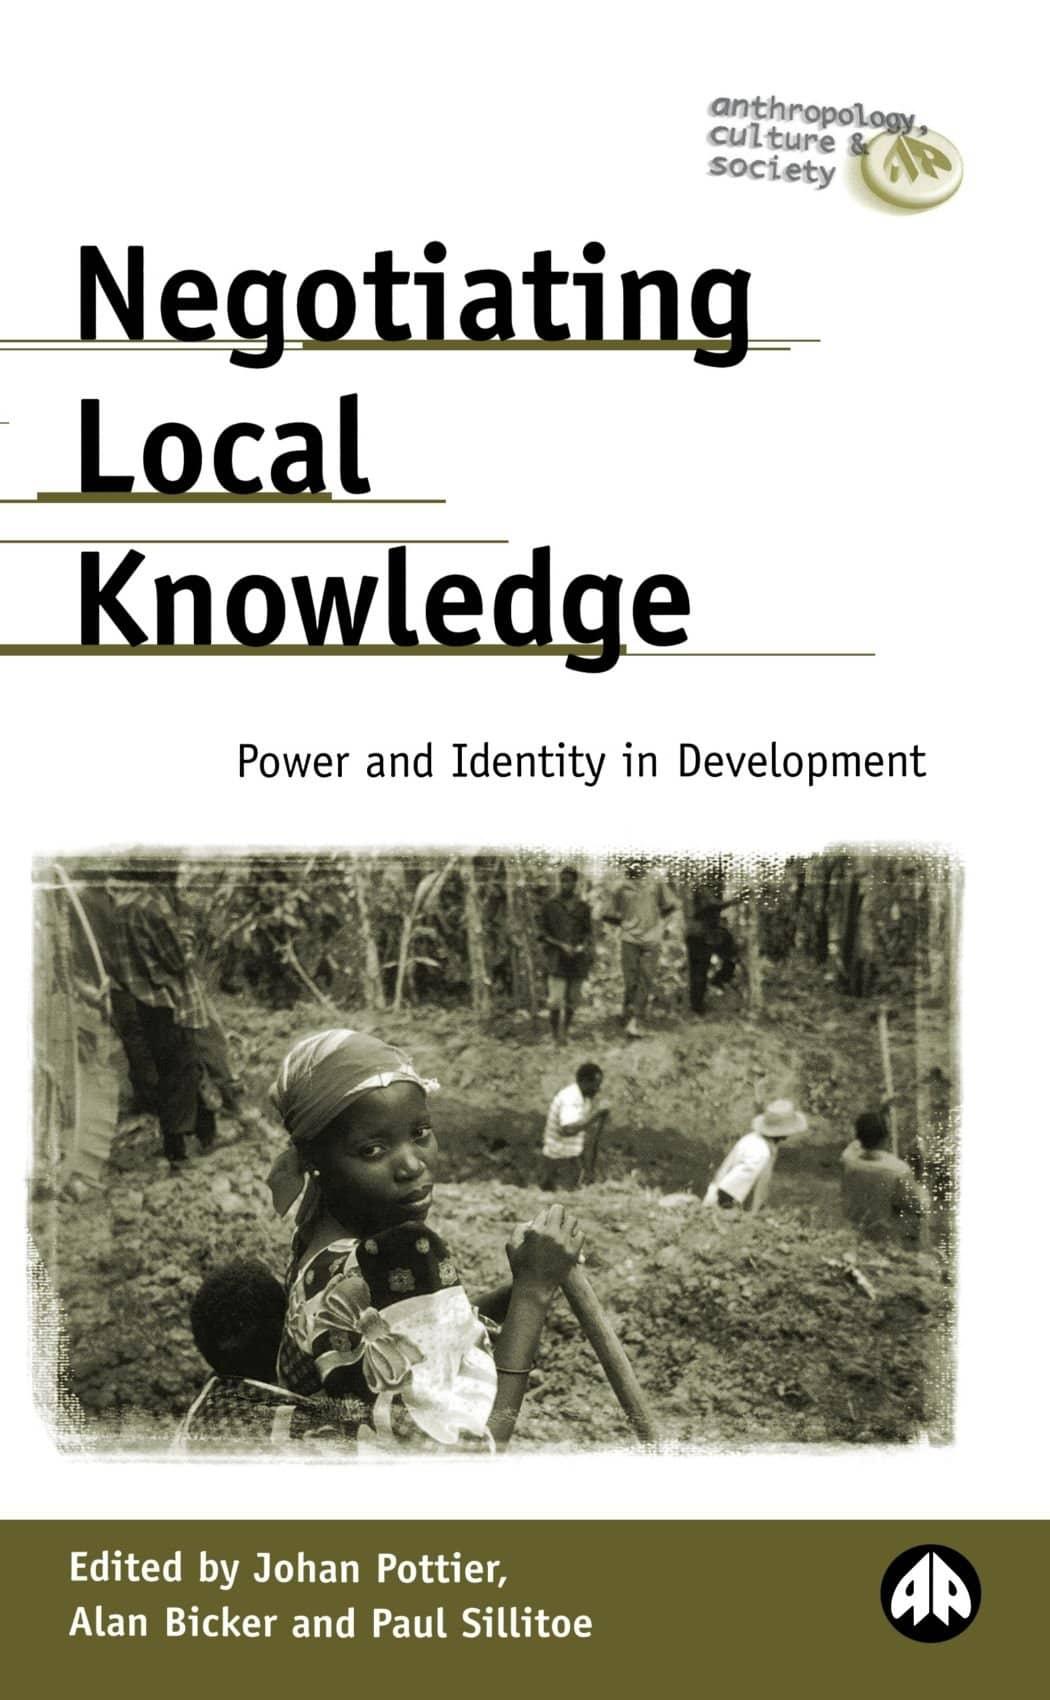 Negotiating Local Knowledge.